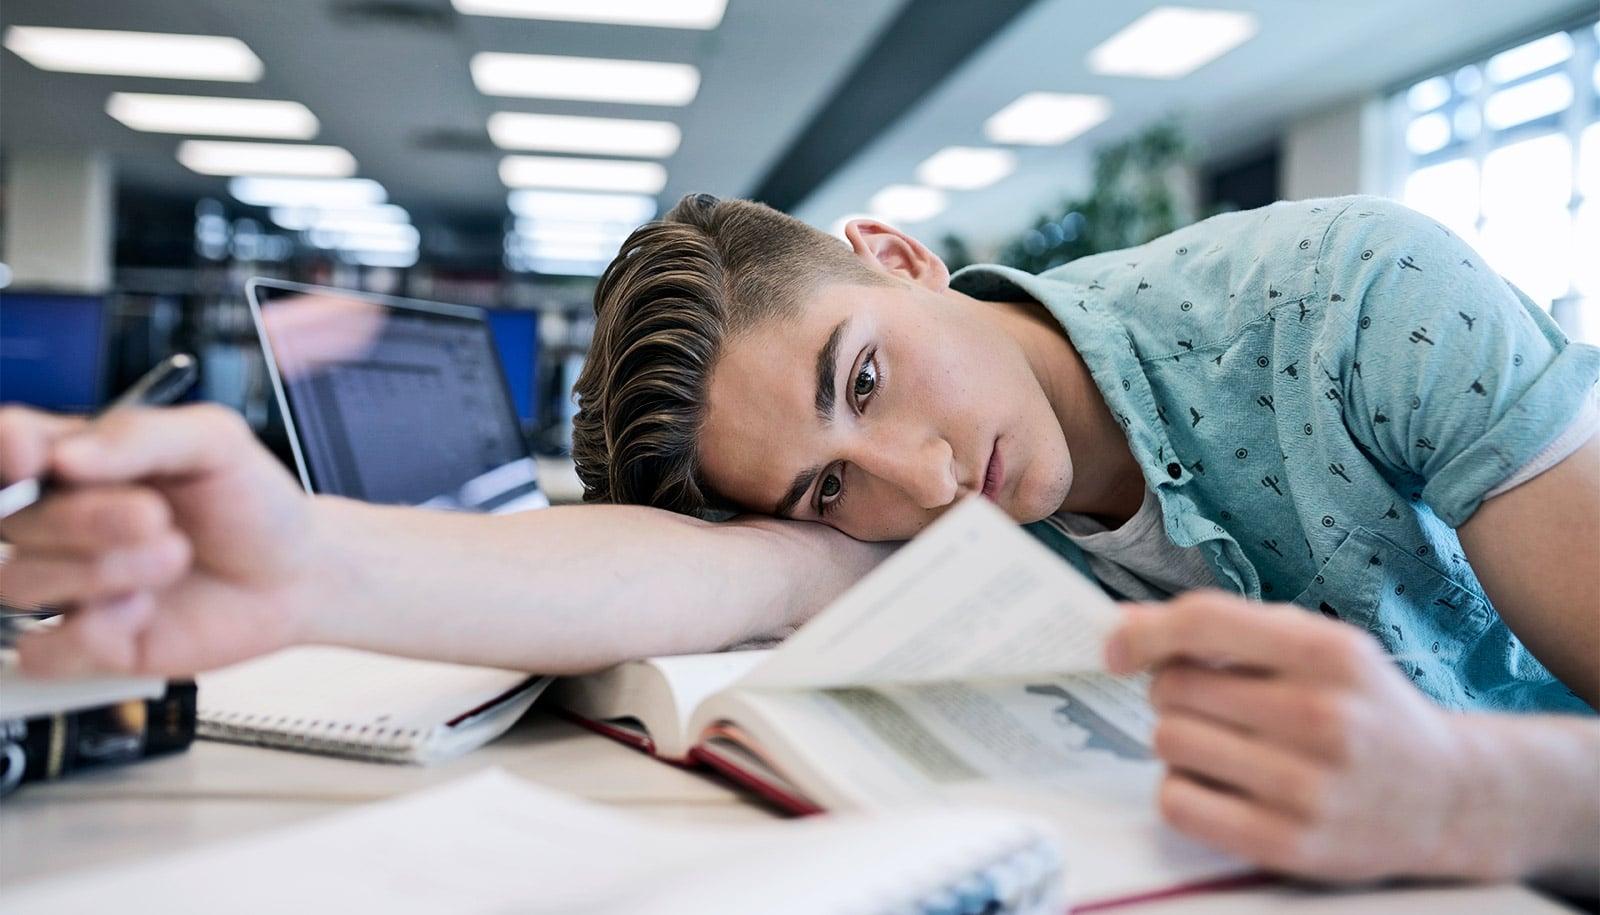 A bit more sleep cuts college student blood pressure